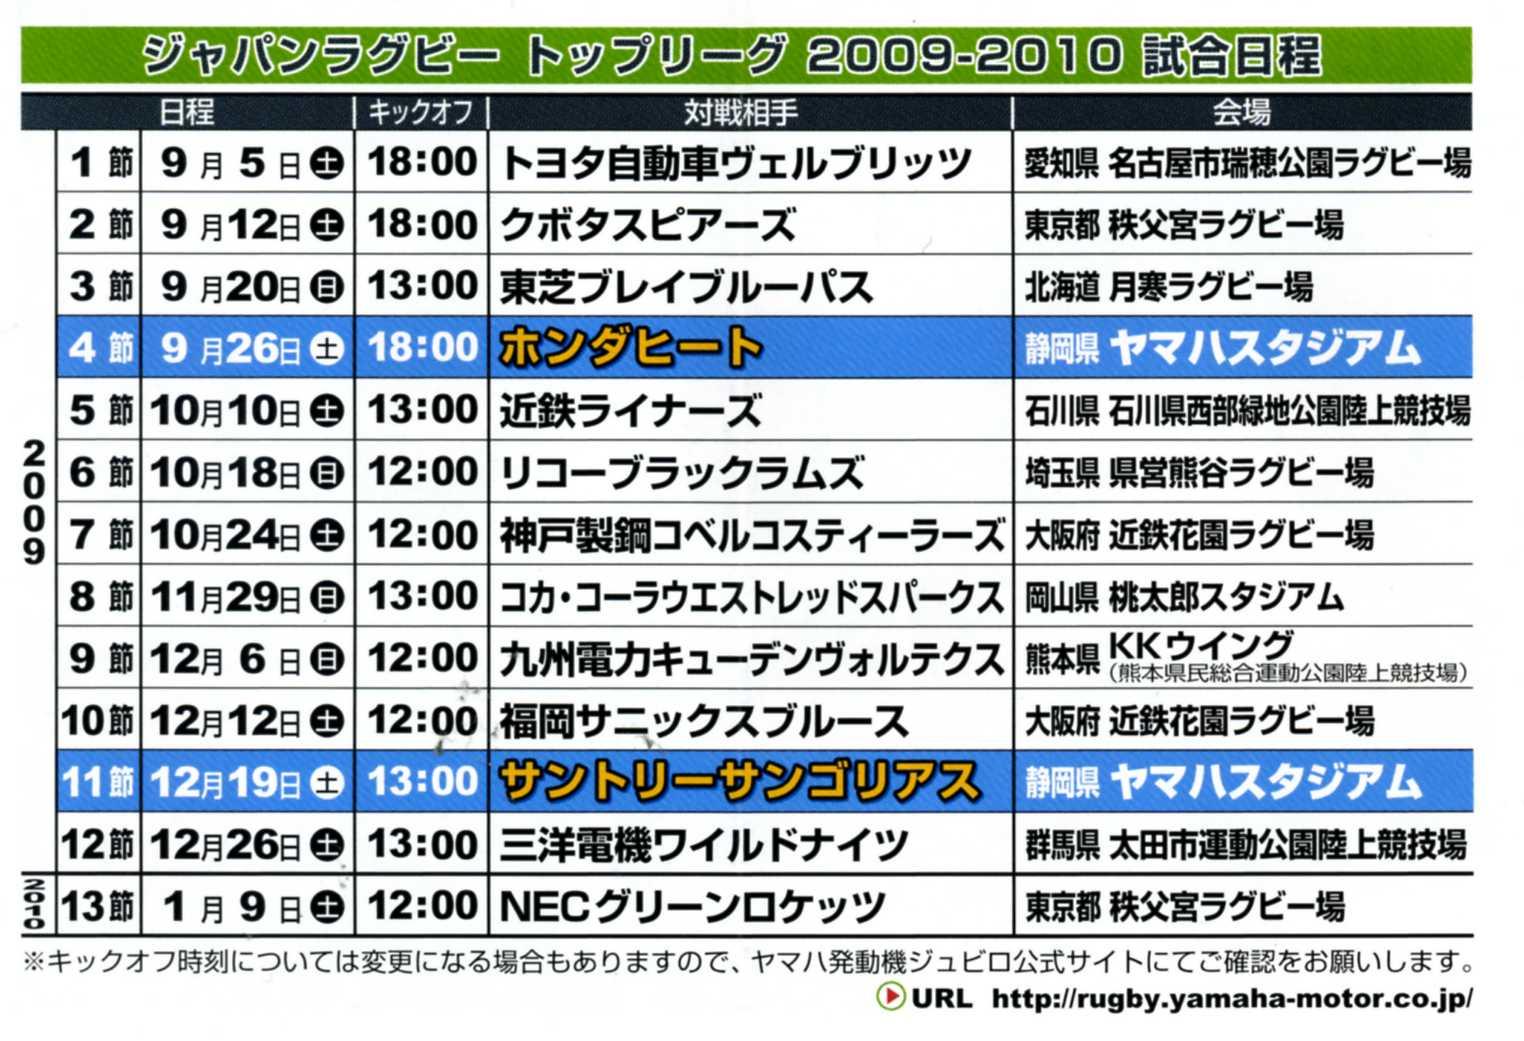 Yamaha_members_2009002